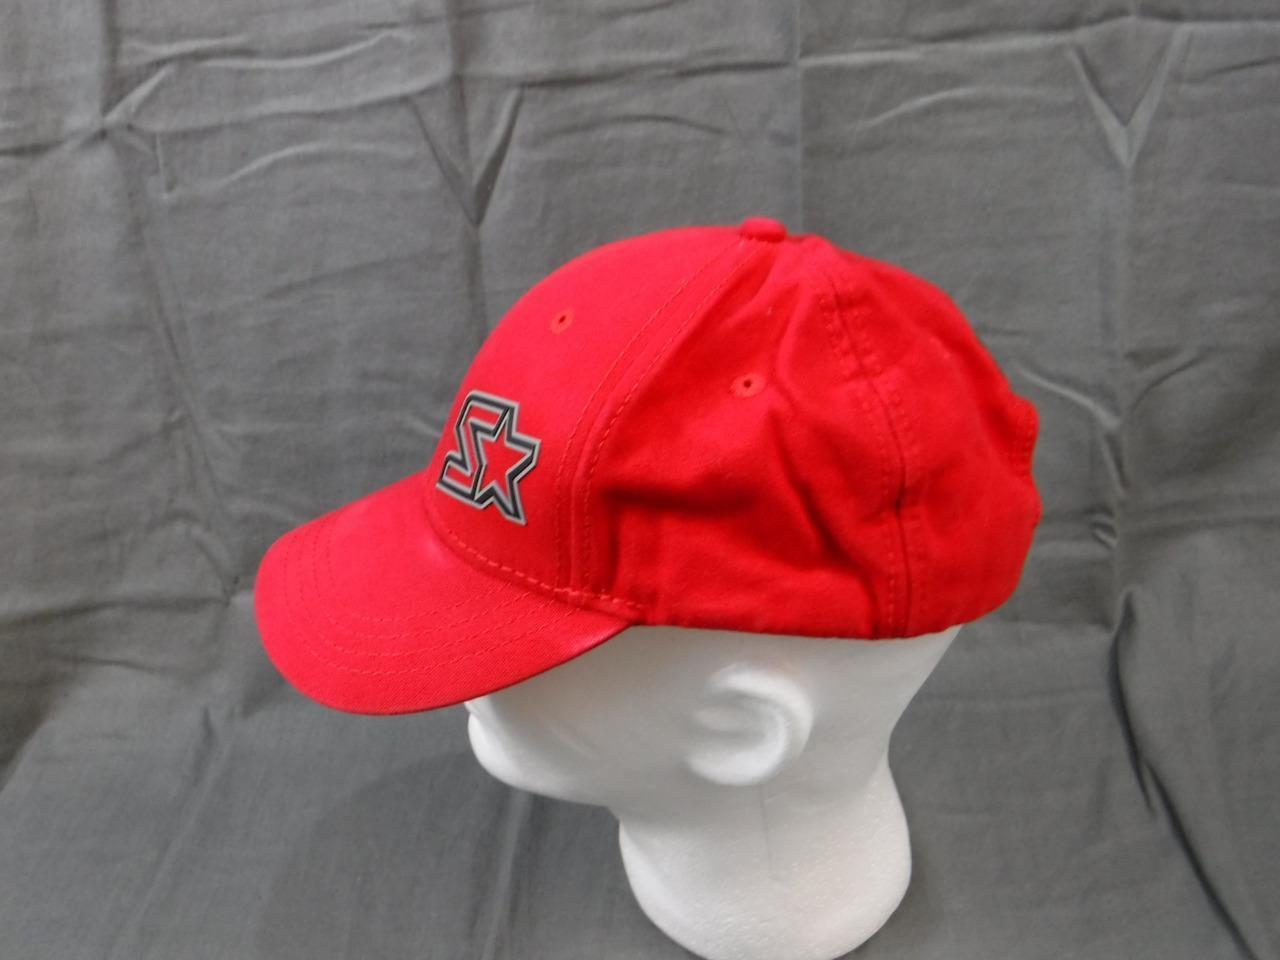 san francisco fe34f 9a5c1 ... norway rare vintage hat baseball cap snapback vintage rare starter red  logo f7999a b0907 5065d